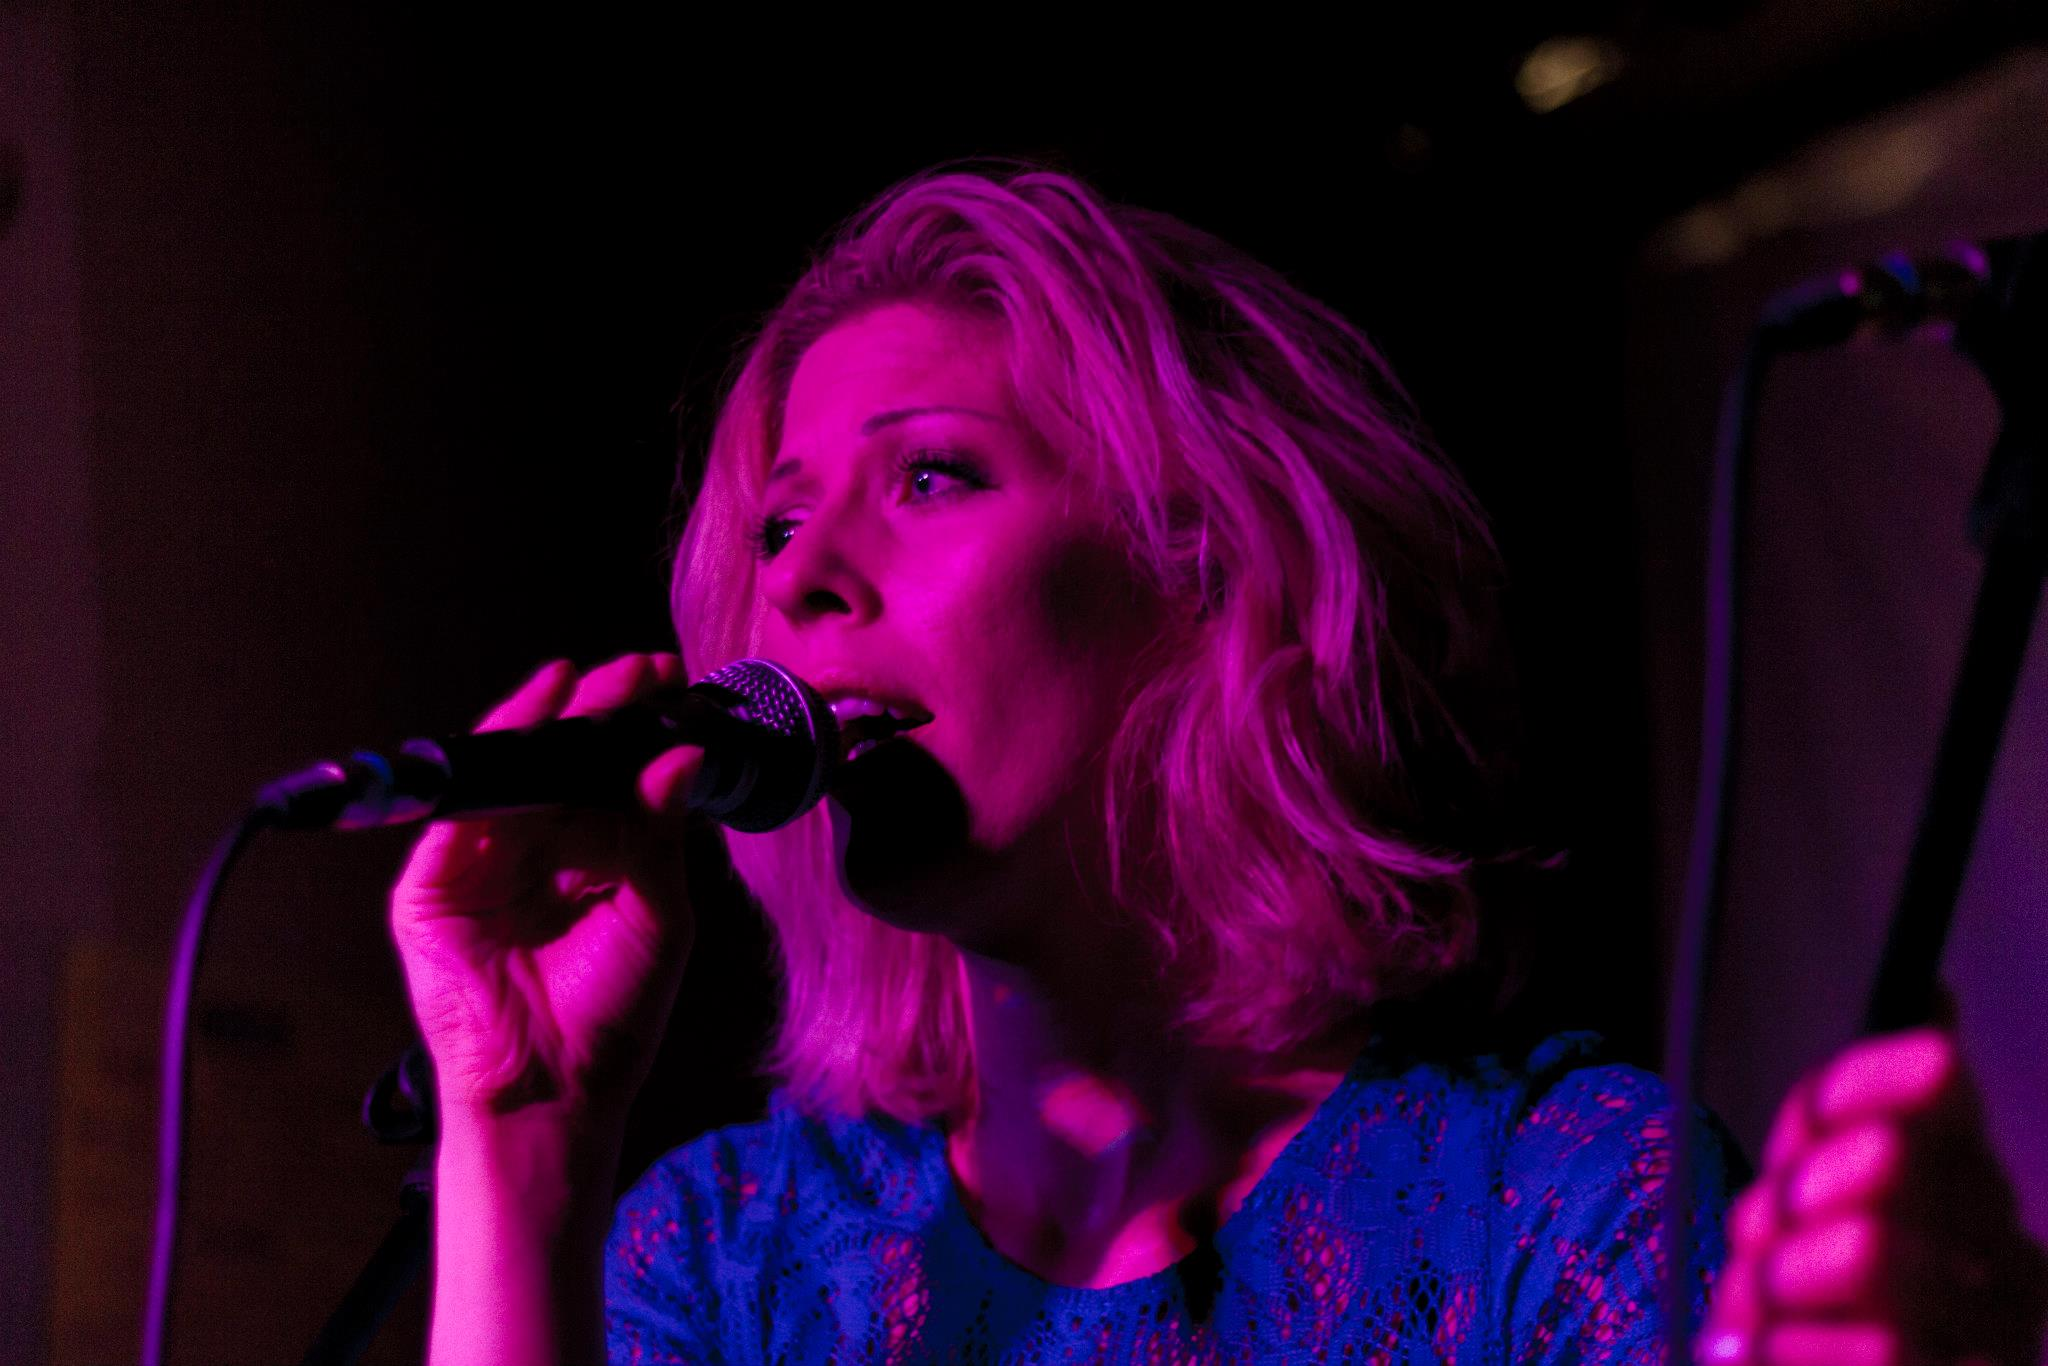 AVAKHAN Lead singer Ava Eckermann at Powers Bar in London